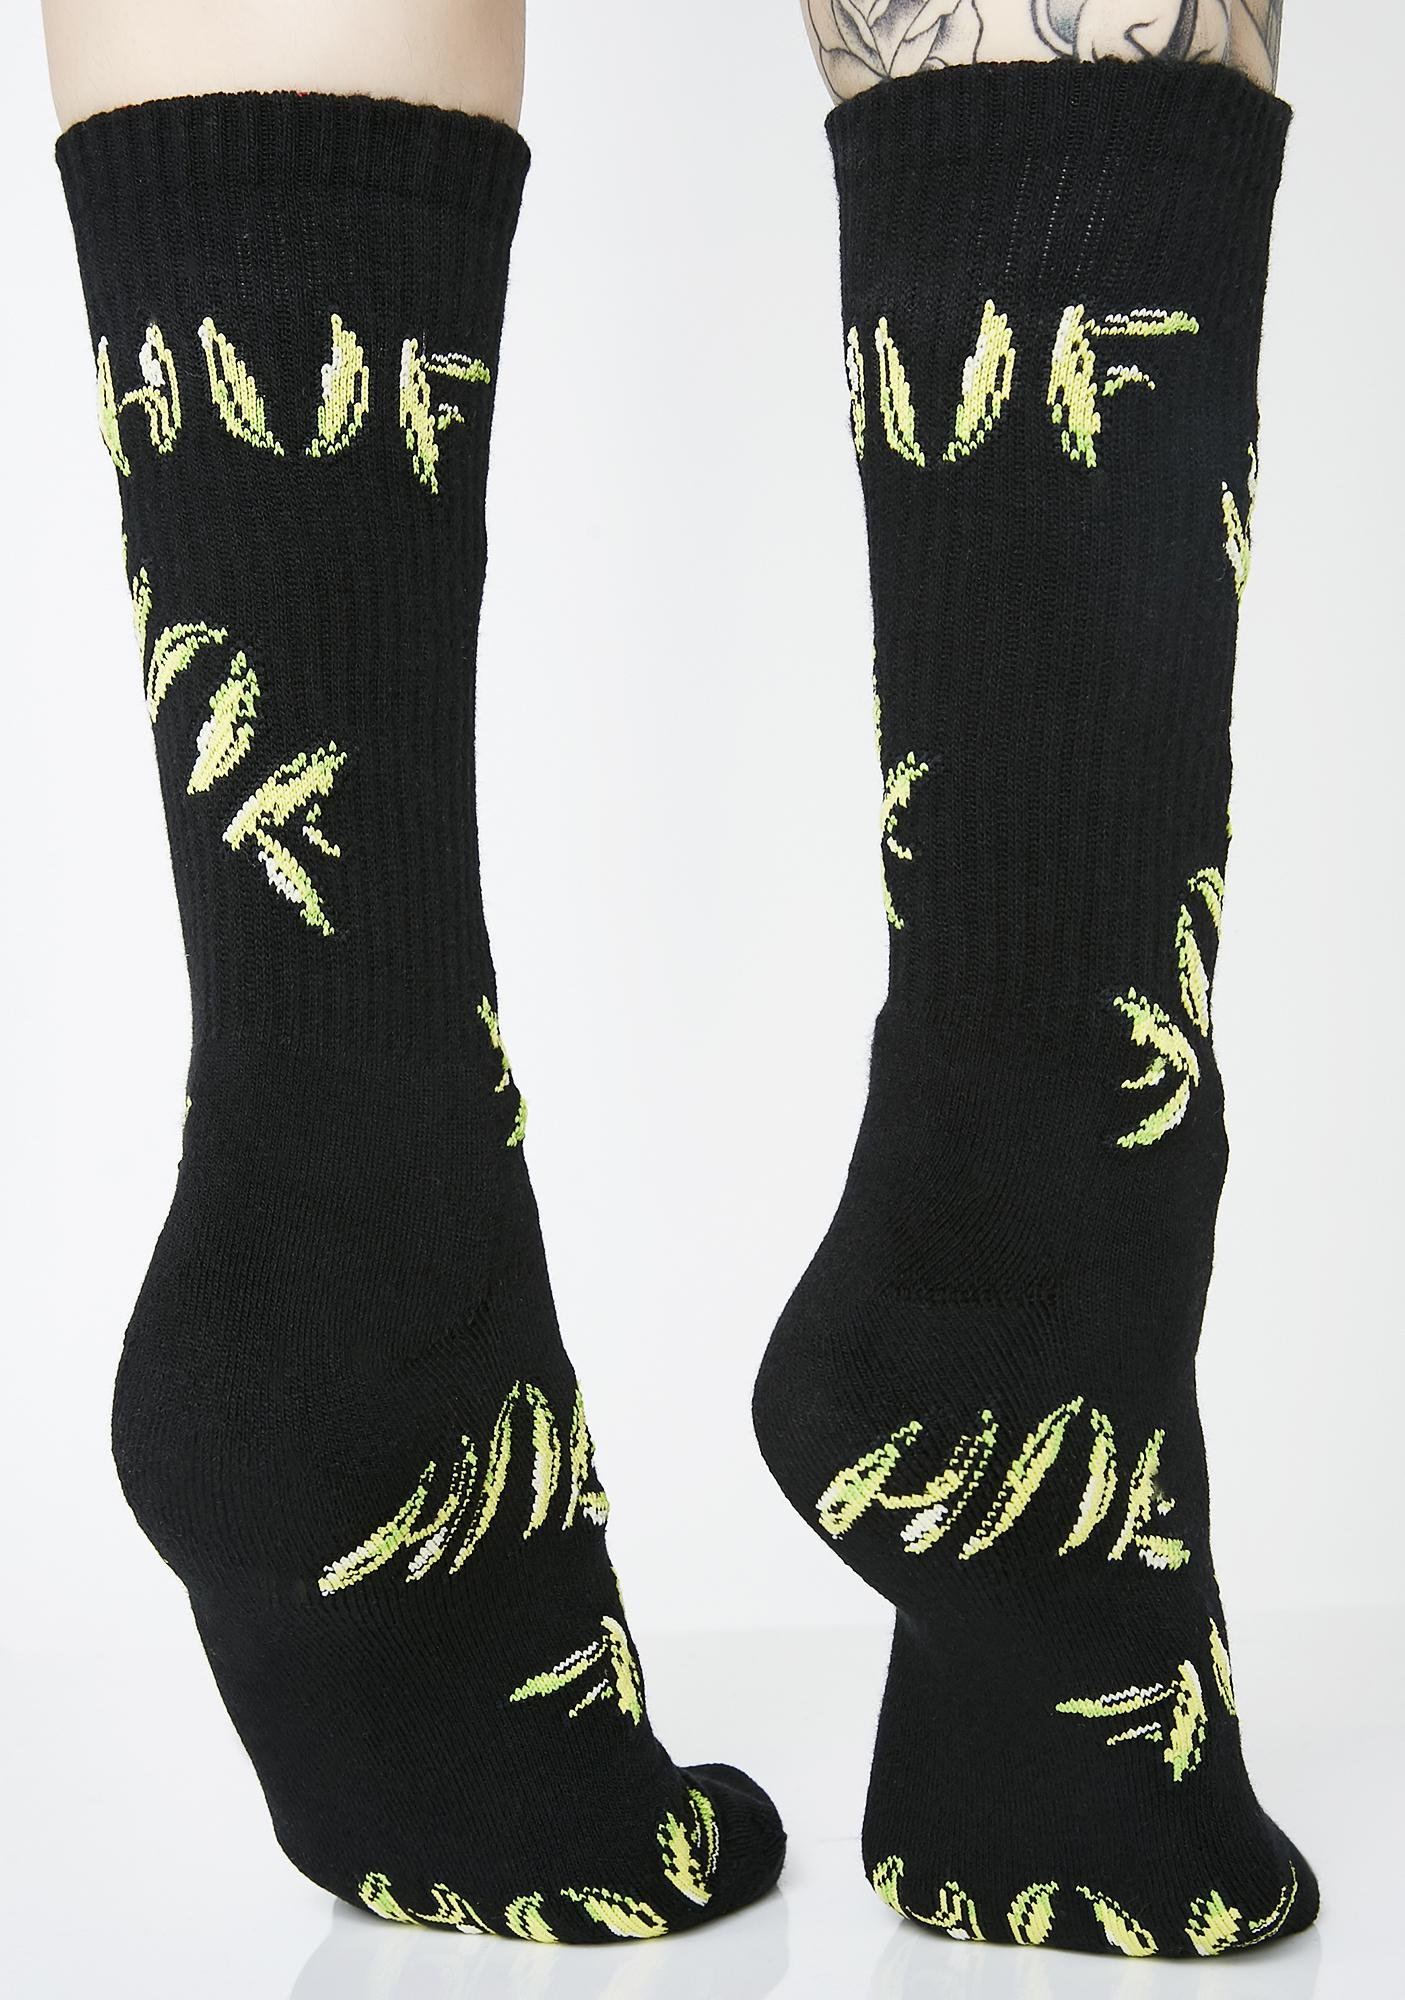 HUF Banana Socks